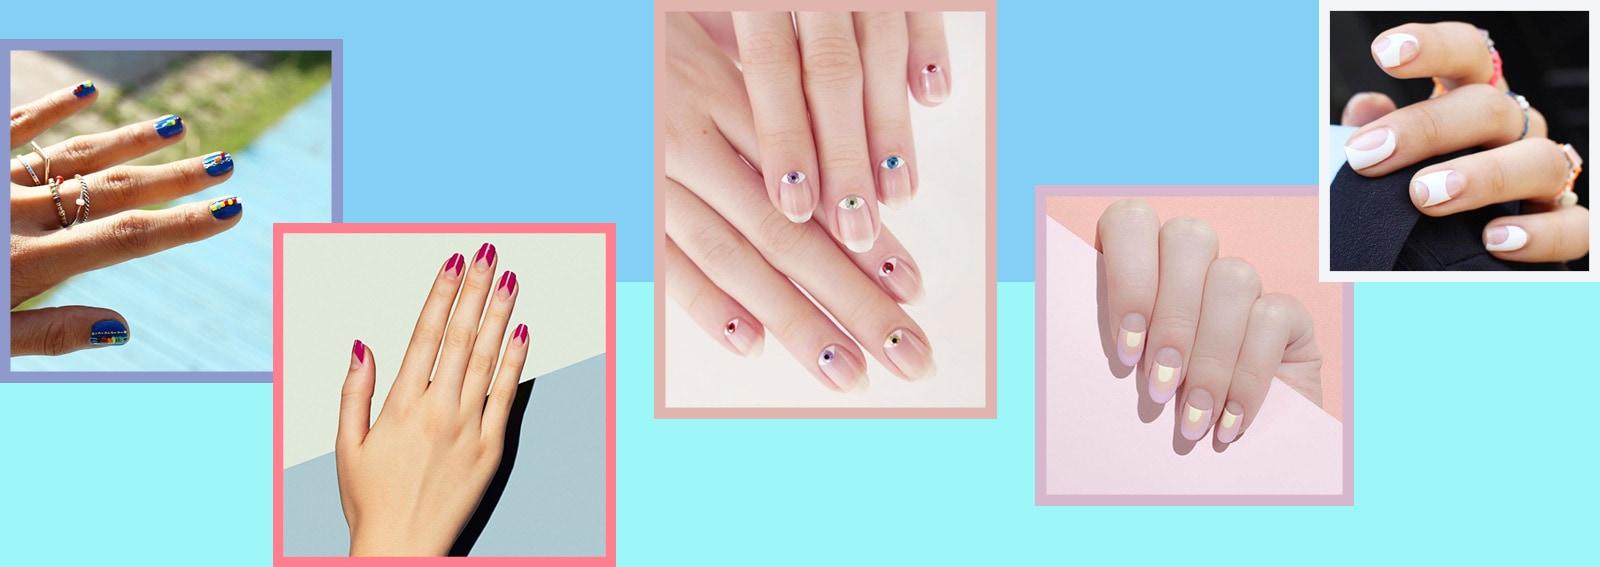 10-nail-art-da-provare-ora-pe2016_desktop